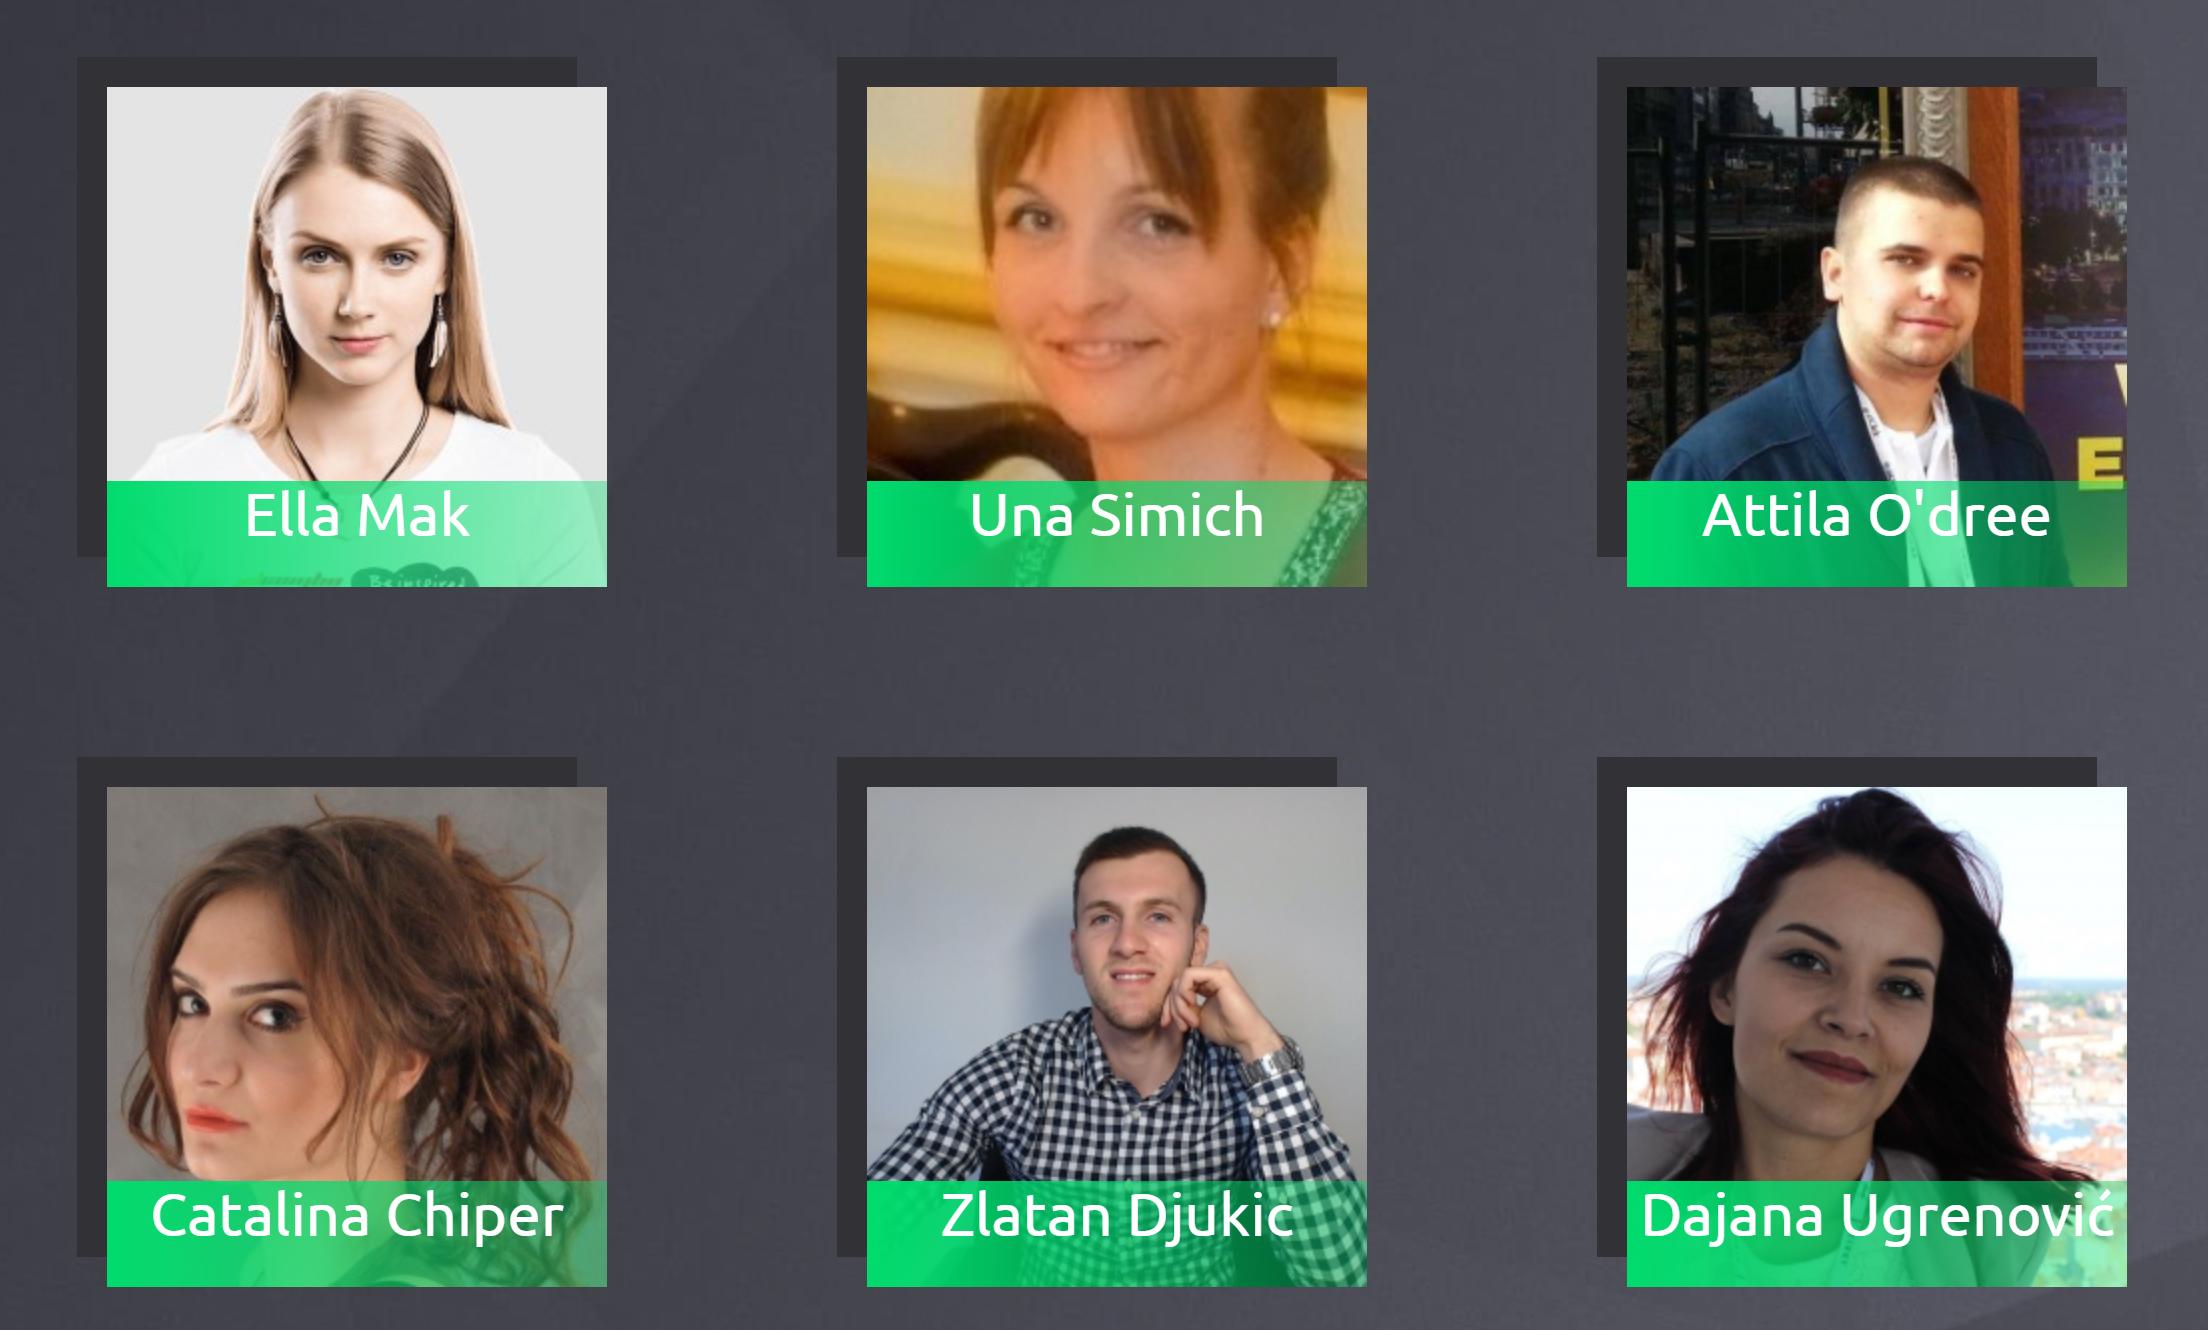 addays europe budapest event 2018 digital marketing speakers